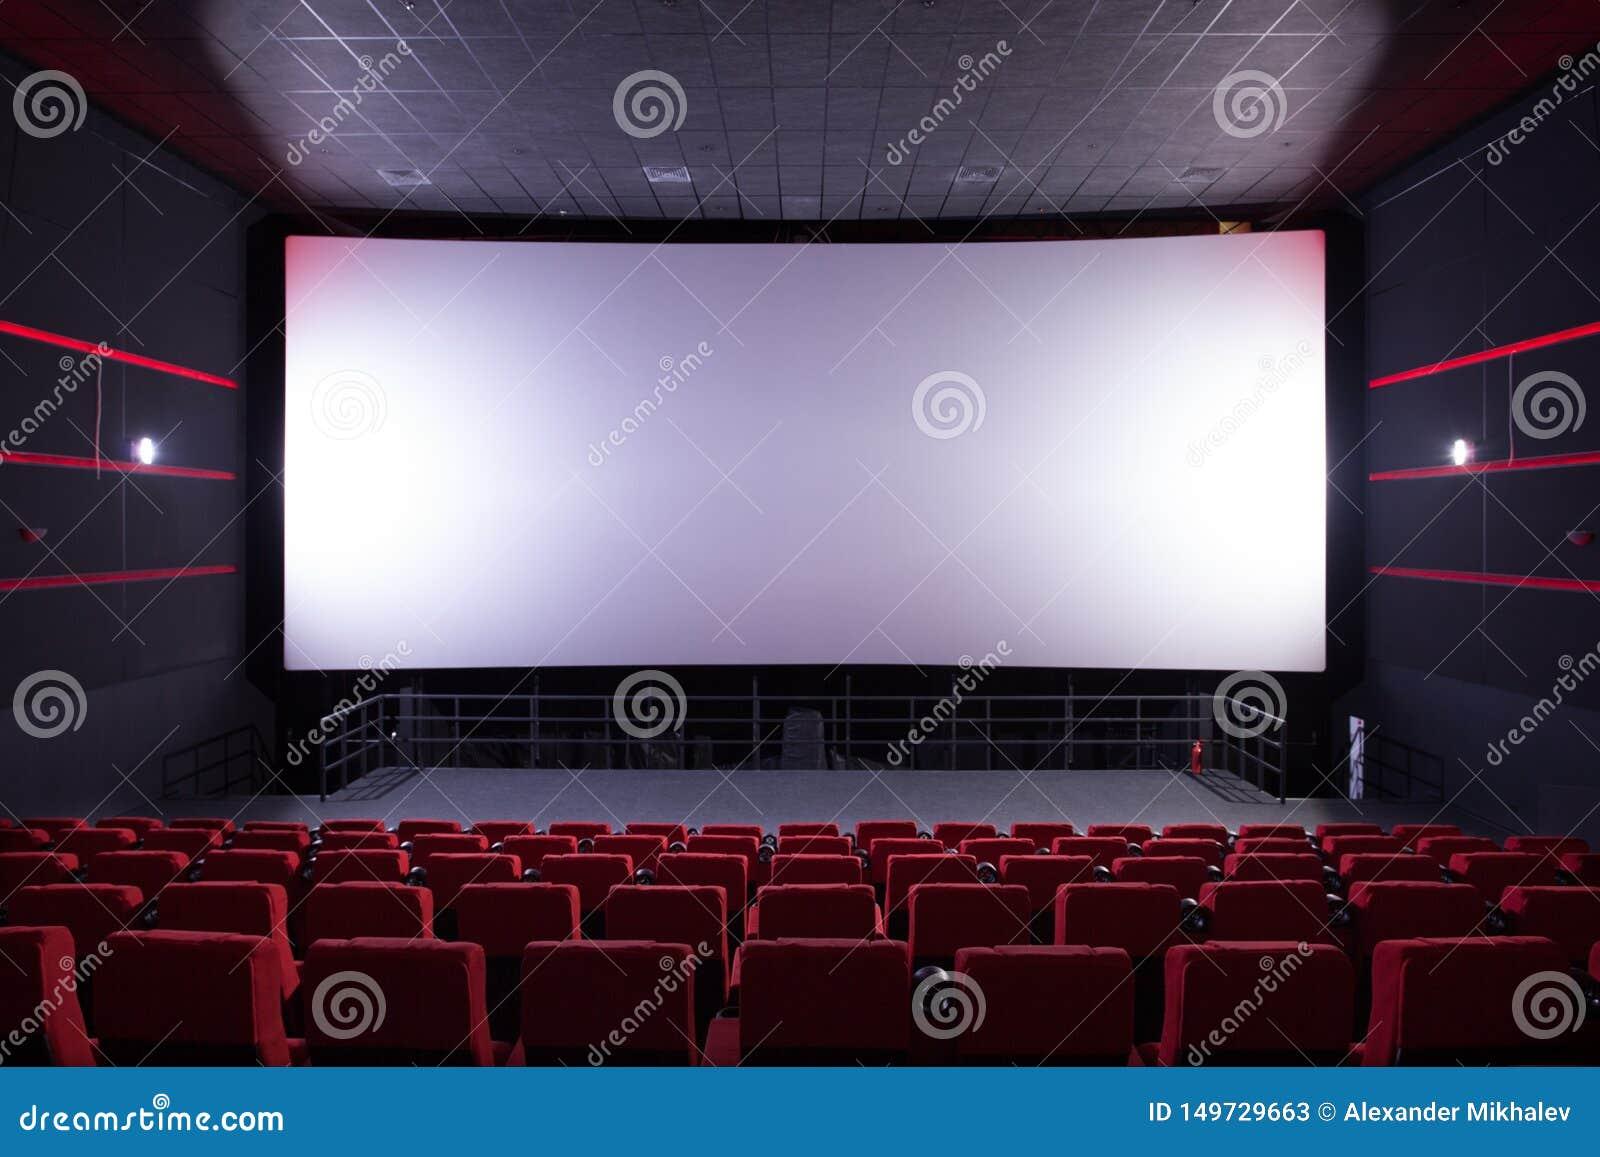 Kinohalle mit roten Stühlen